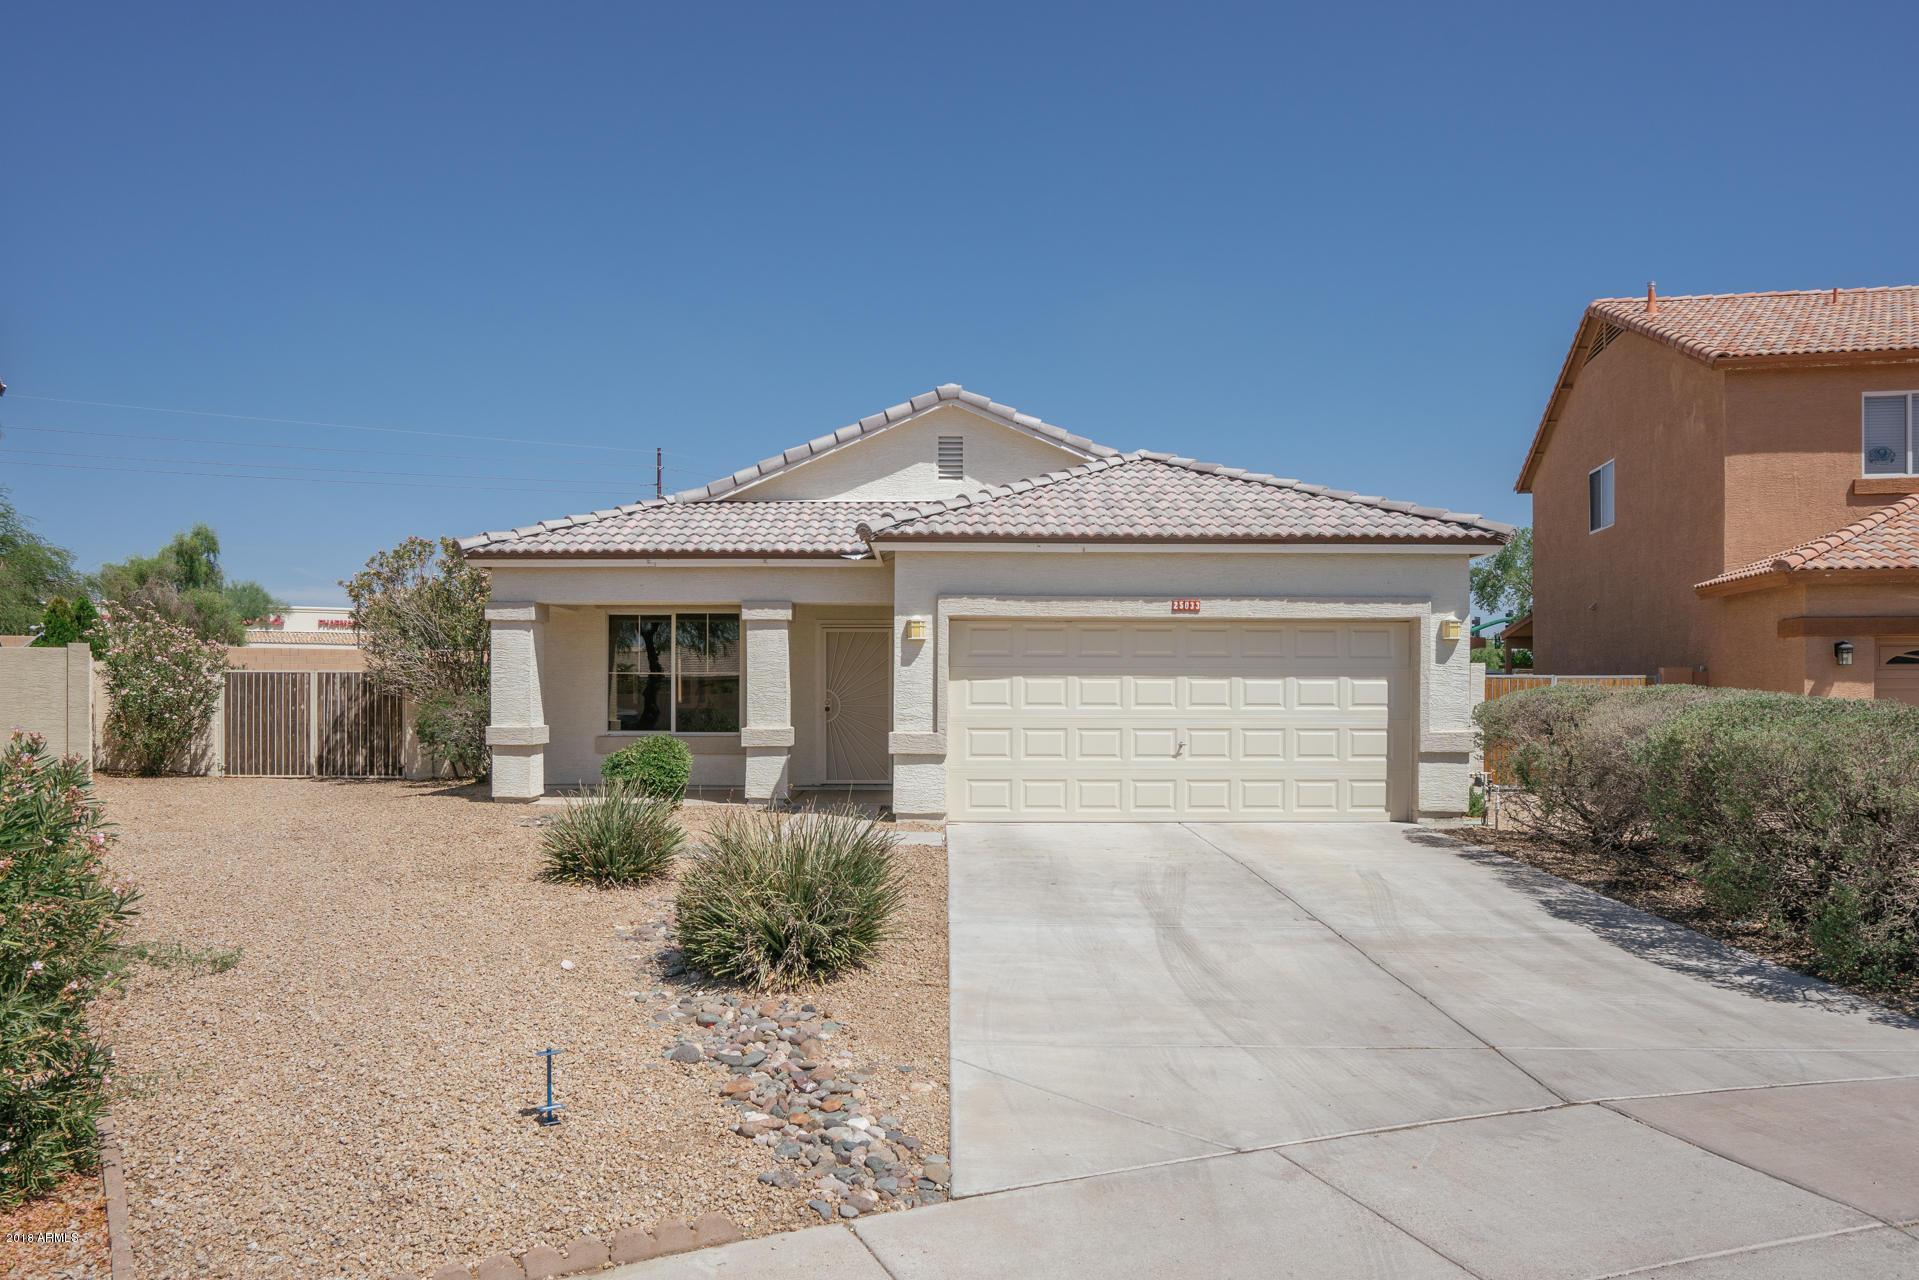 Photo of 25033 N 67TH Drive, Peoria, AZ 85383